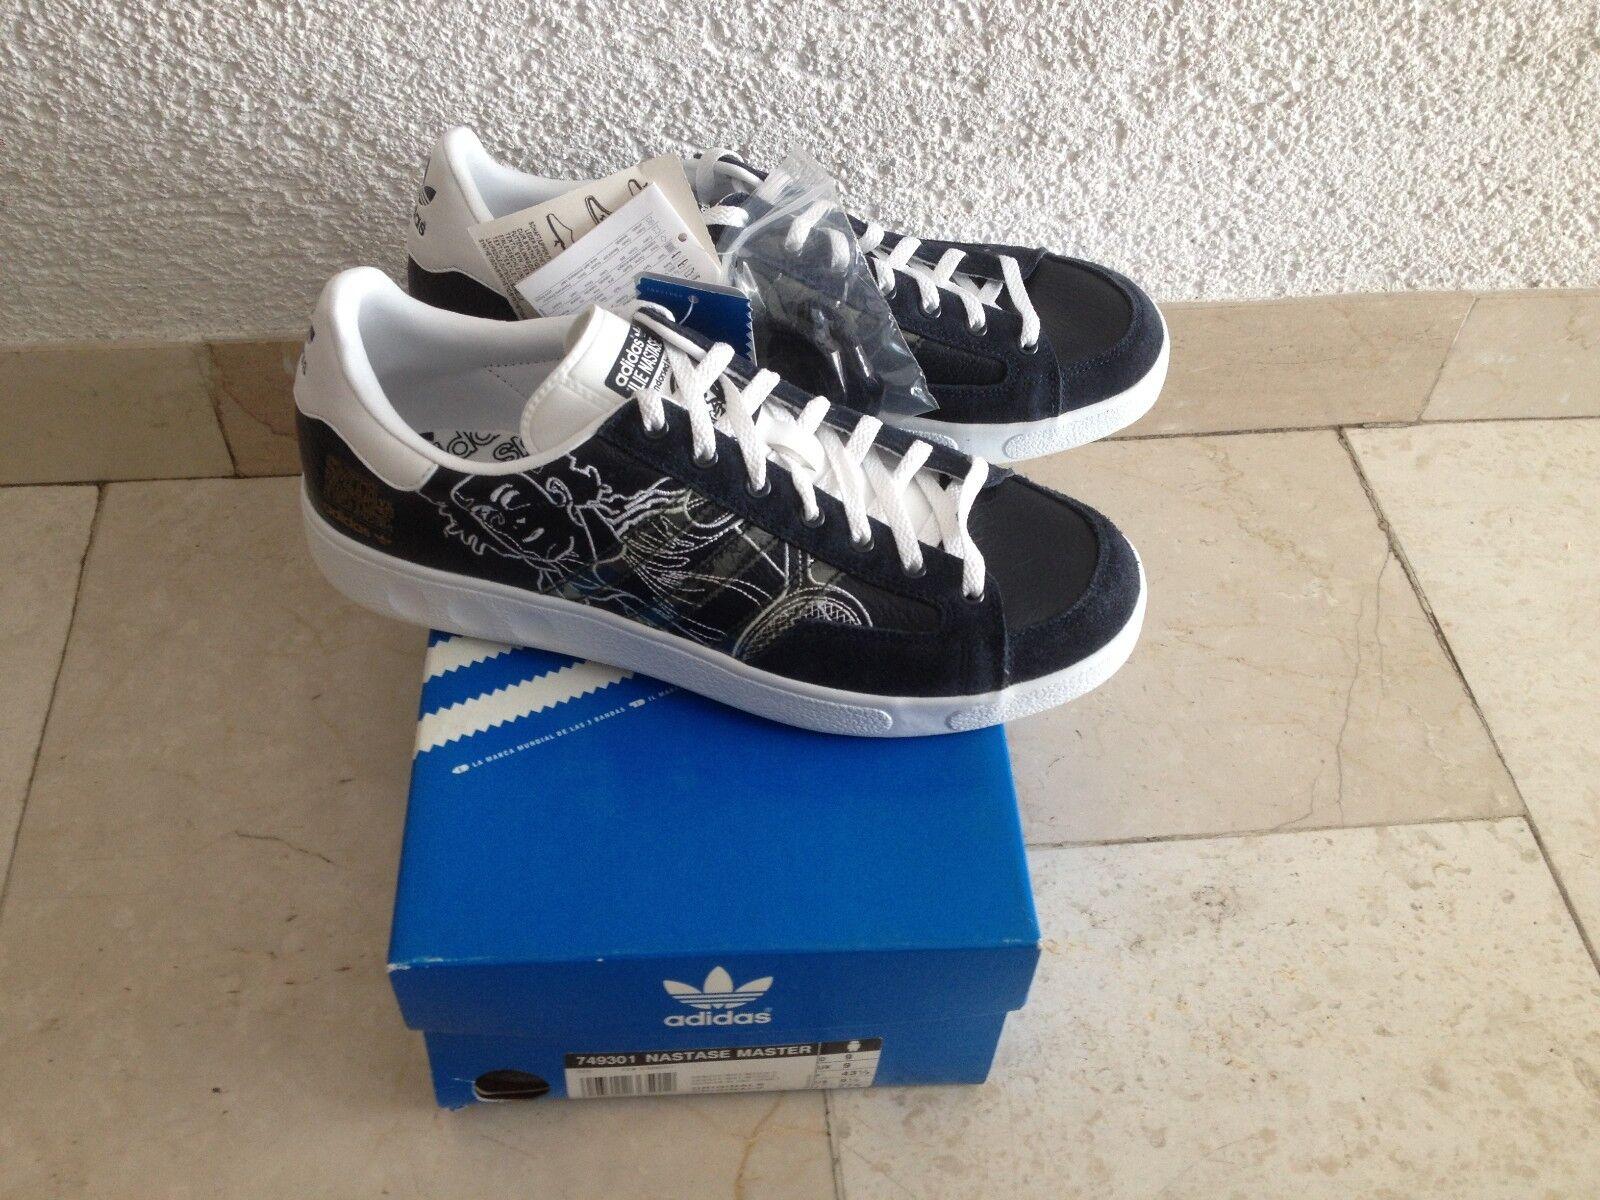 Adidas us nastase Master 43 1/3 us Adidas 9.5 BNWT 749301 ilie Stan Smith PROD. 11/05 ad6051